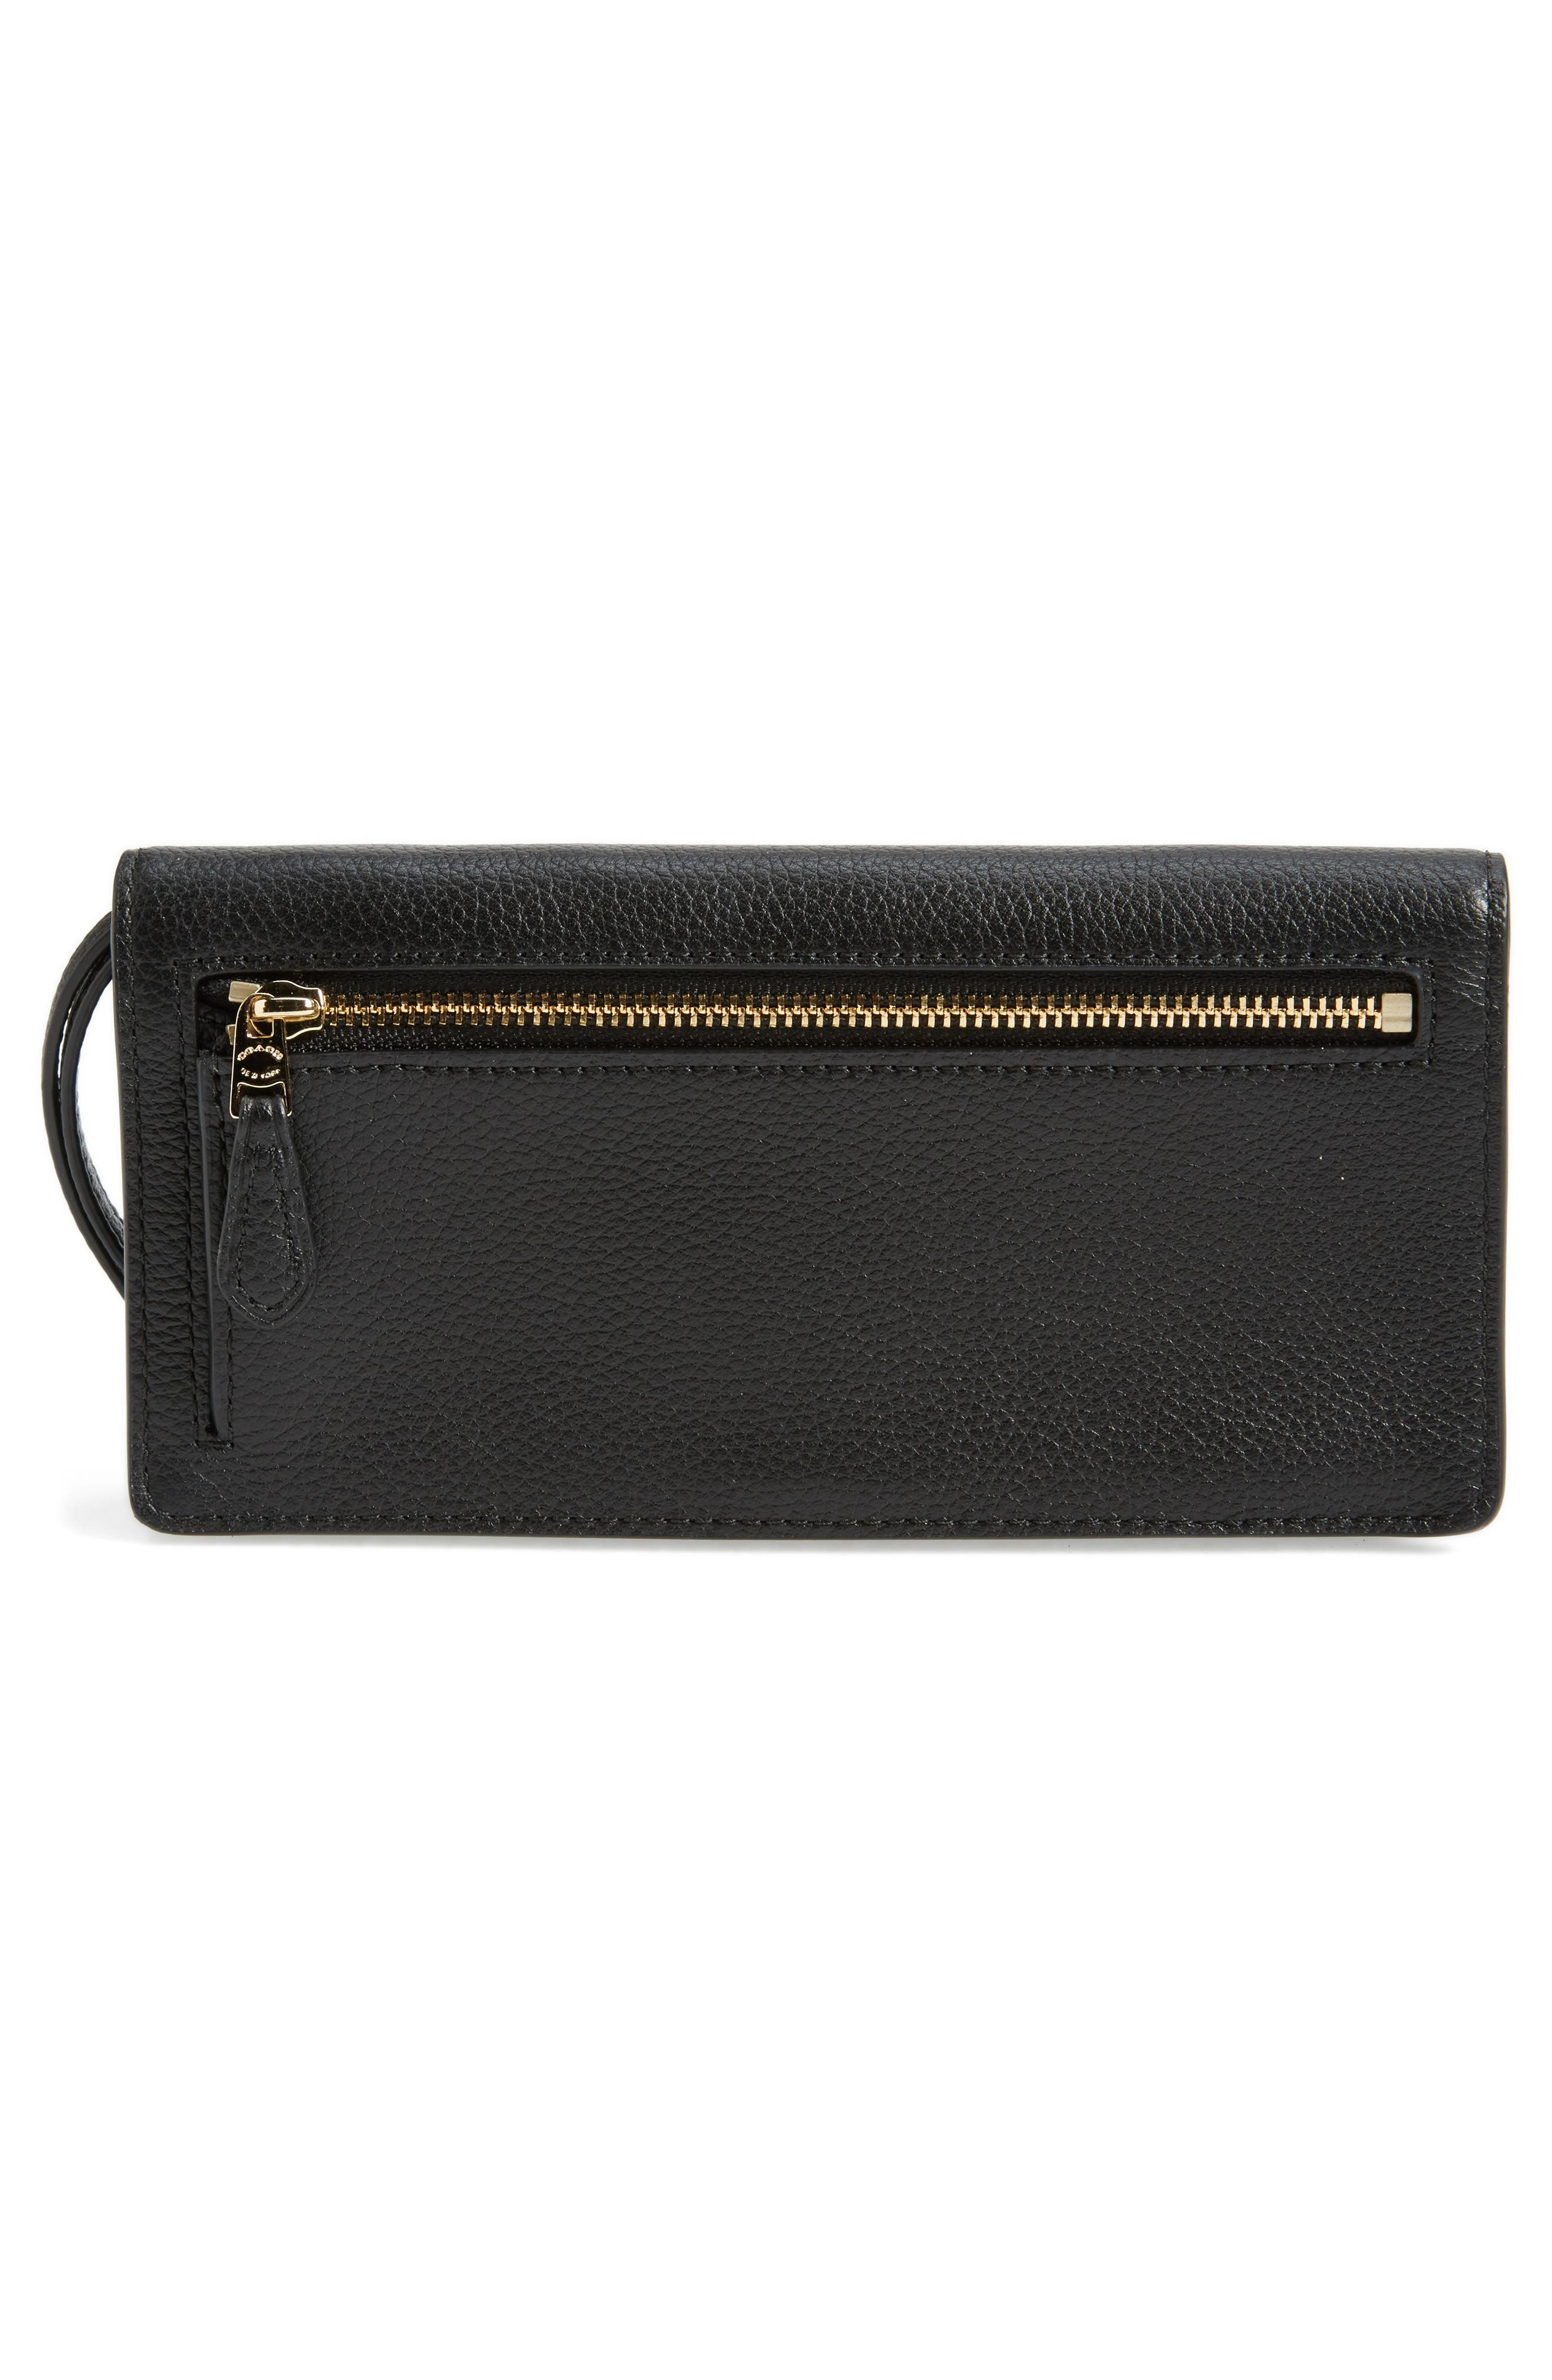 Slim Calfskin Leather Wristlet,                             Alternate thumbnail 3, color,                             Black